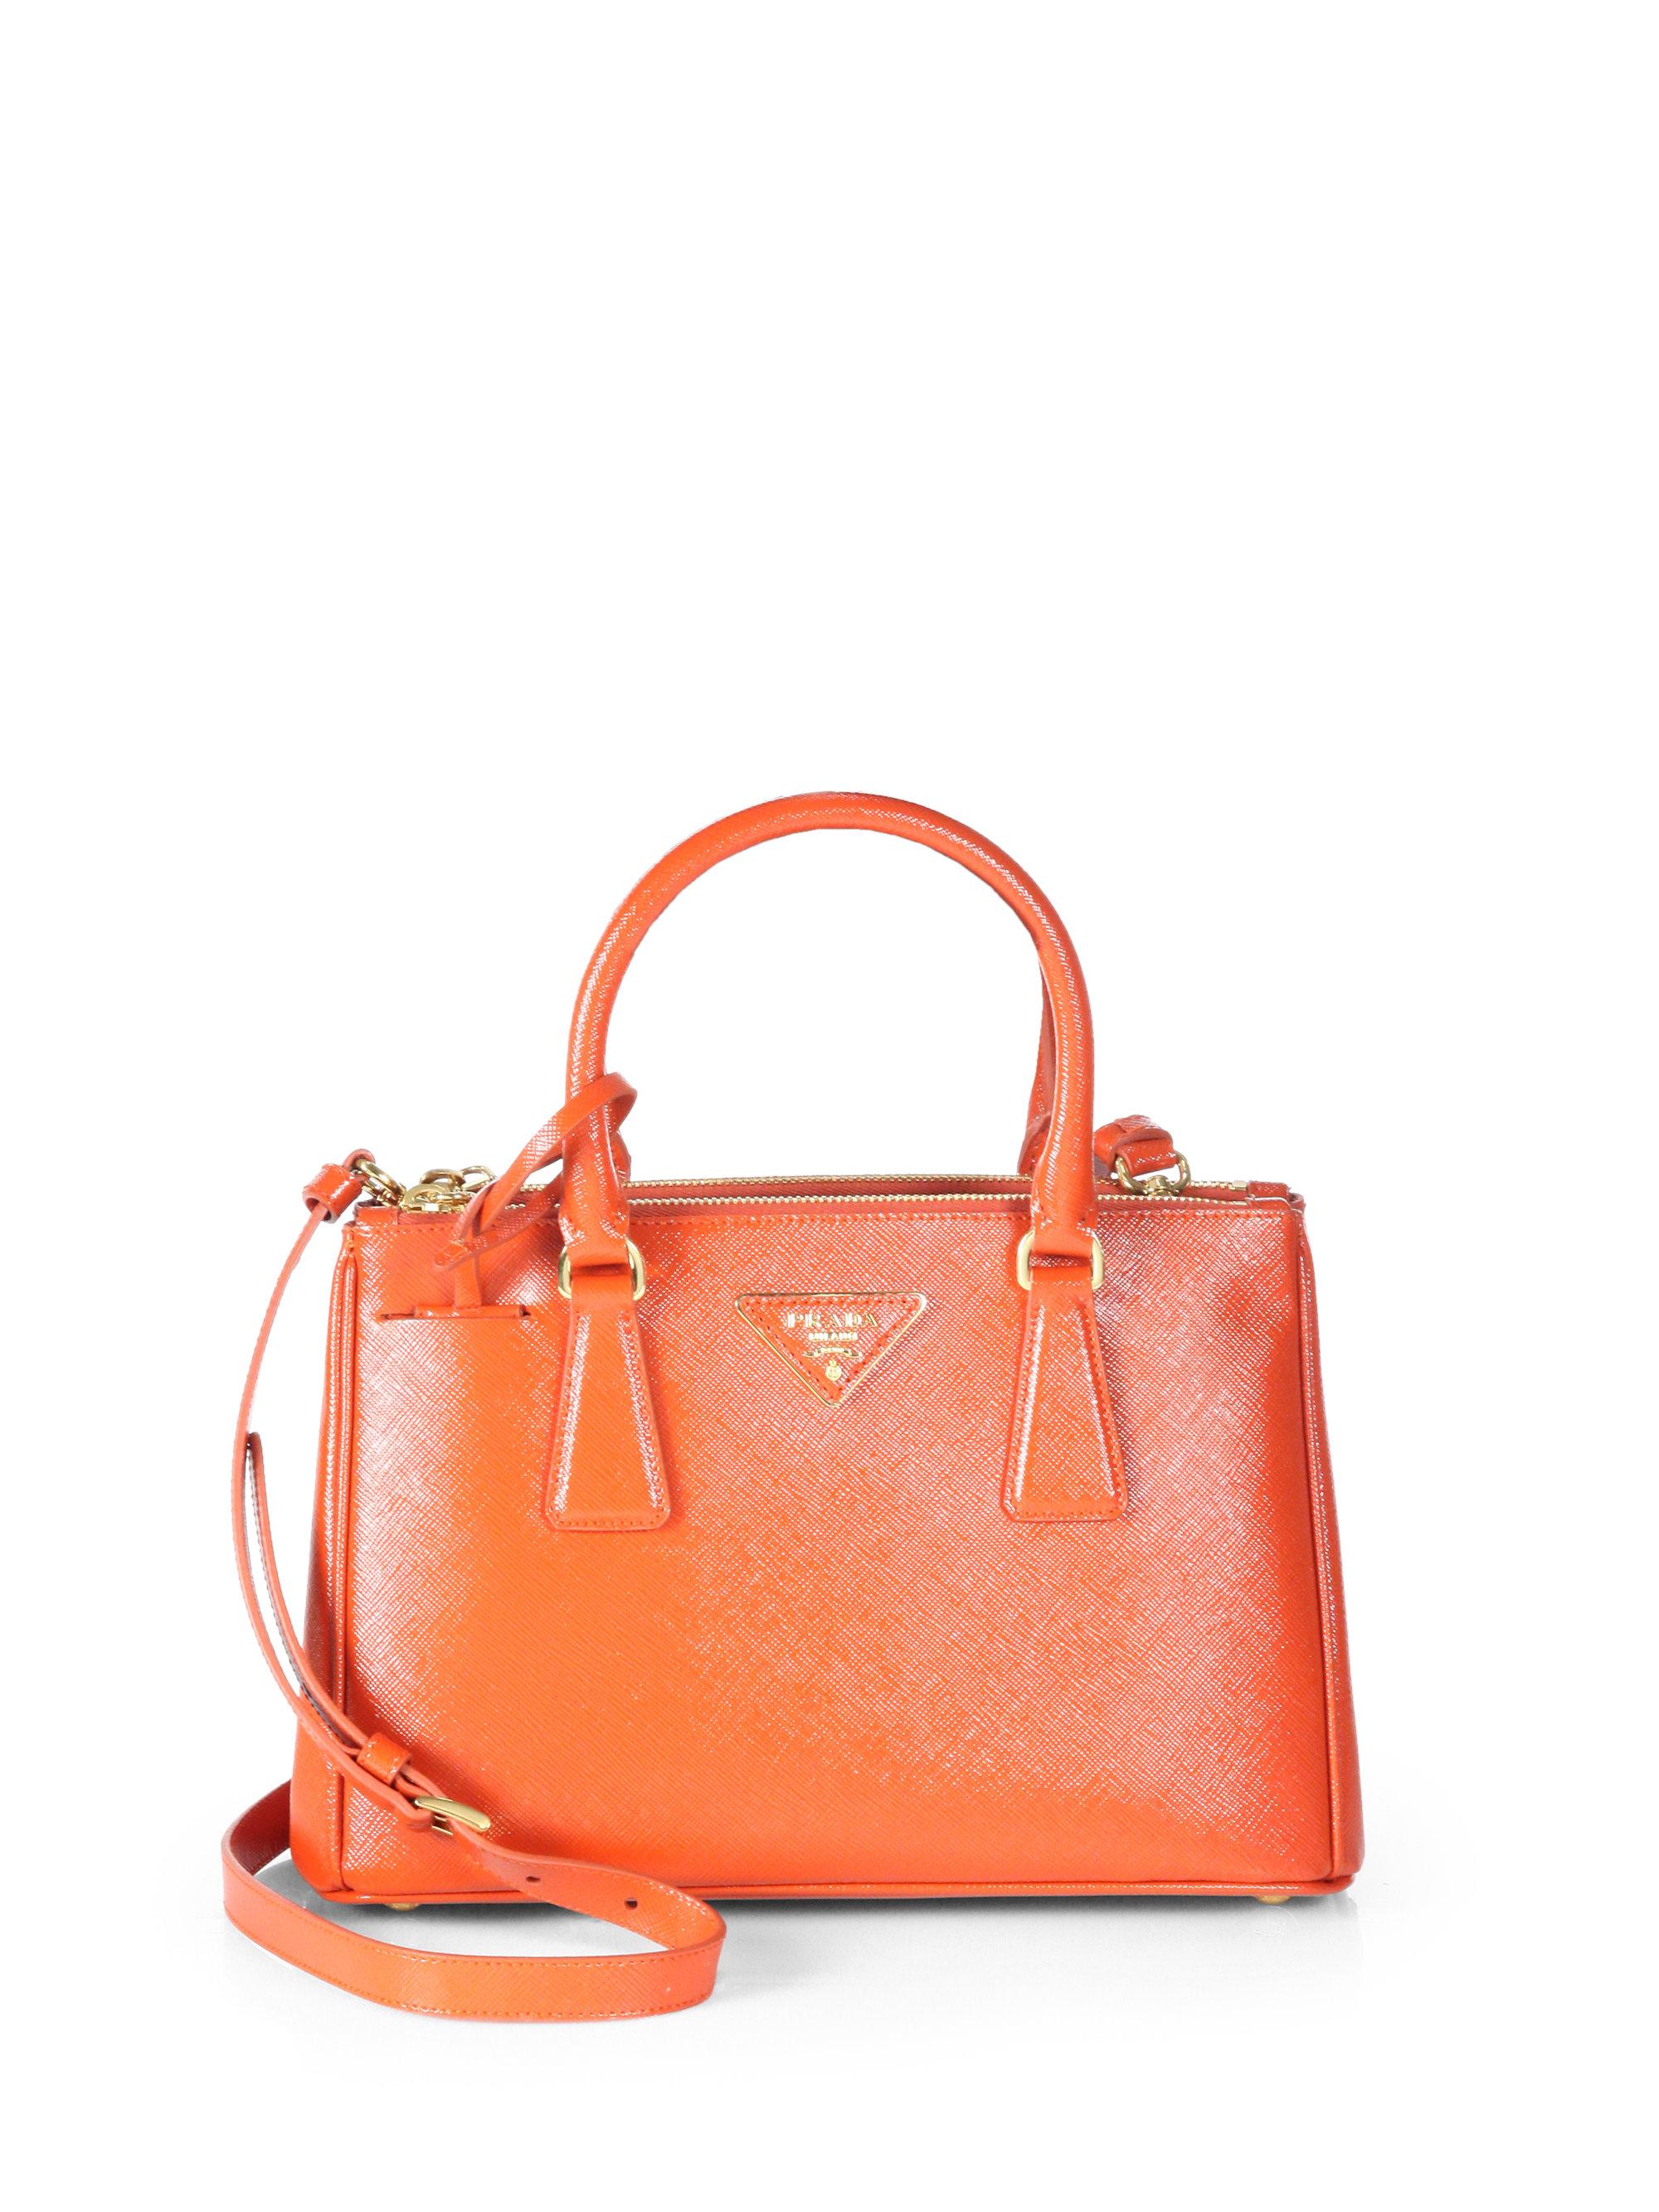 Prada Saffiano Vernice Tote Bag in Orange (arancio-orange)  ffc0e52aaefbc